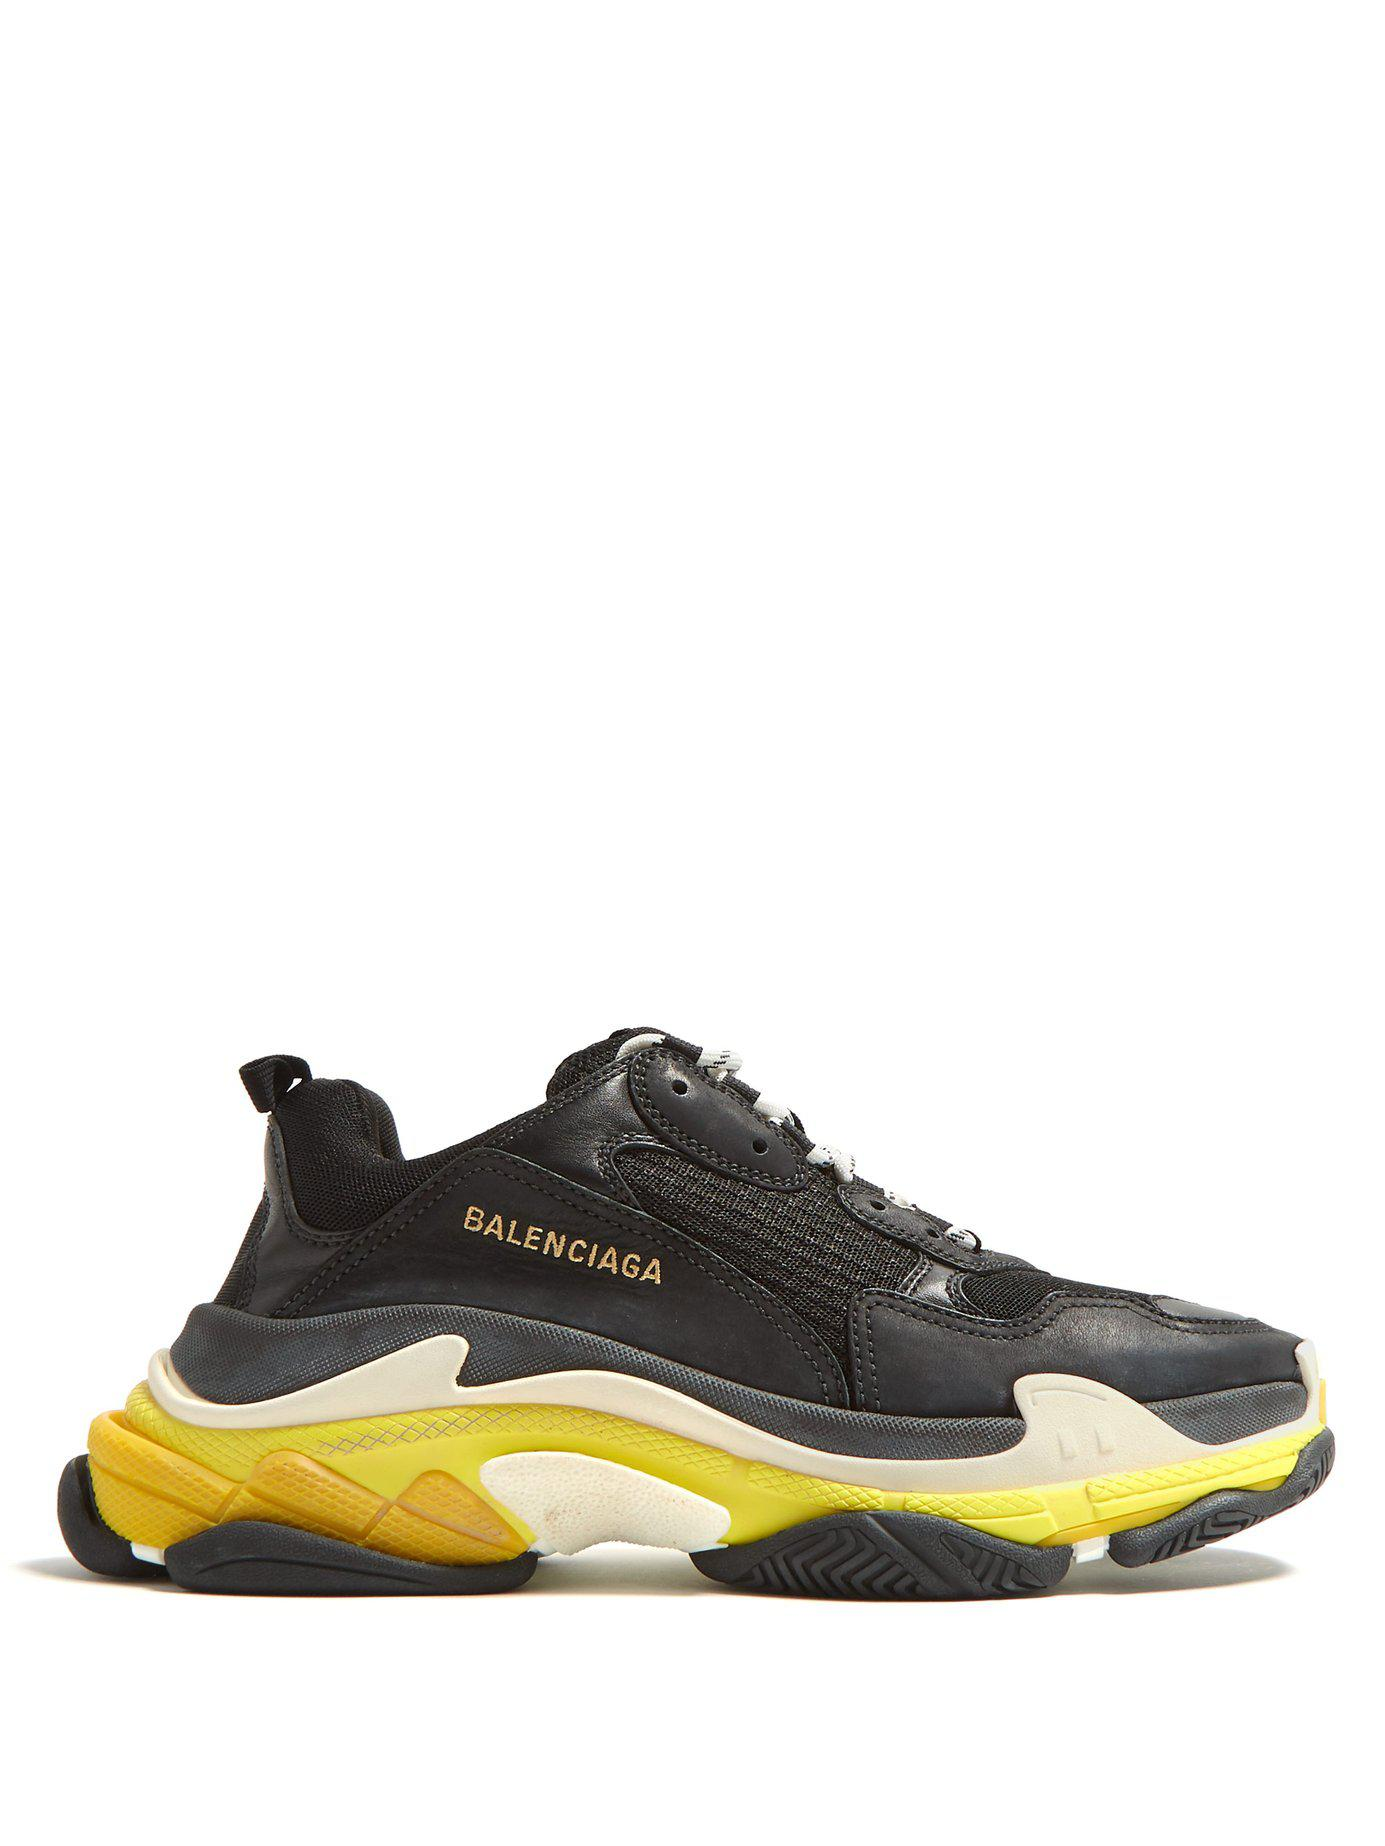 5999947bbbc0 Balenciaga - Black Triple S Sneakers for Men - Lyst. View fullscreen